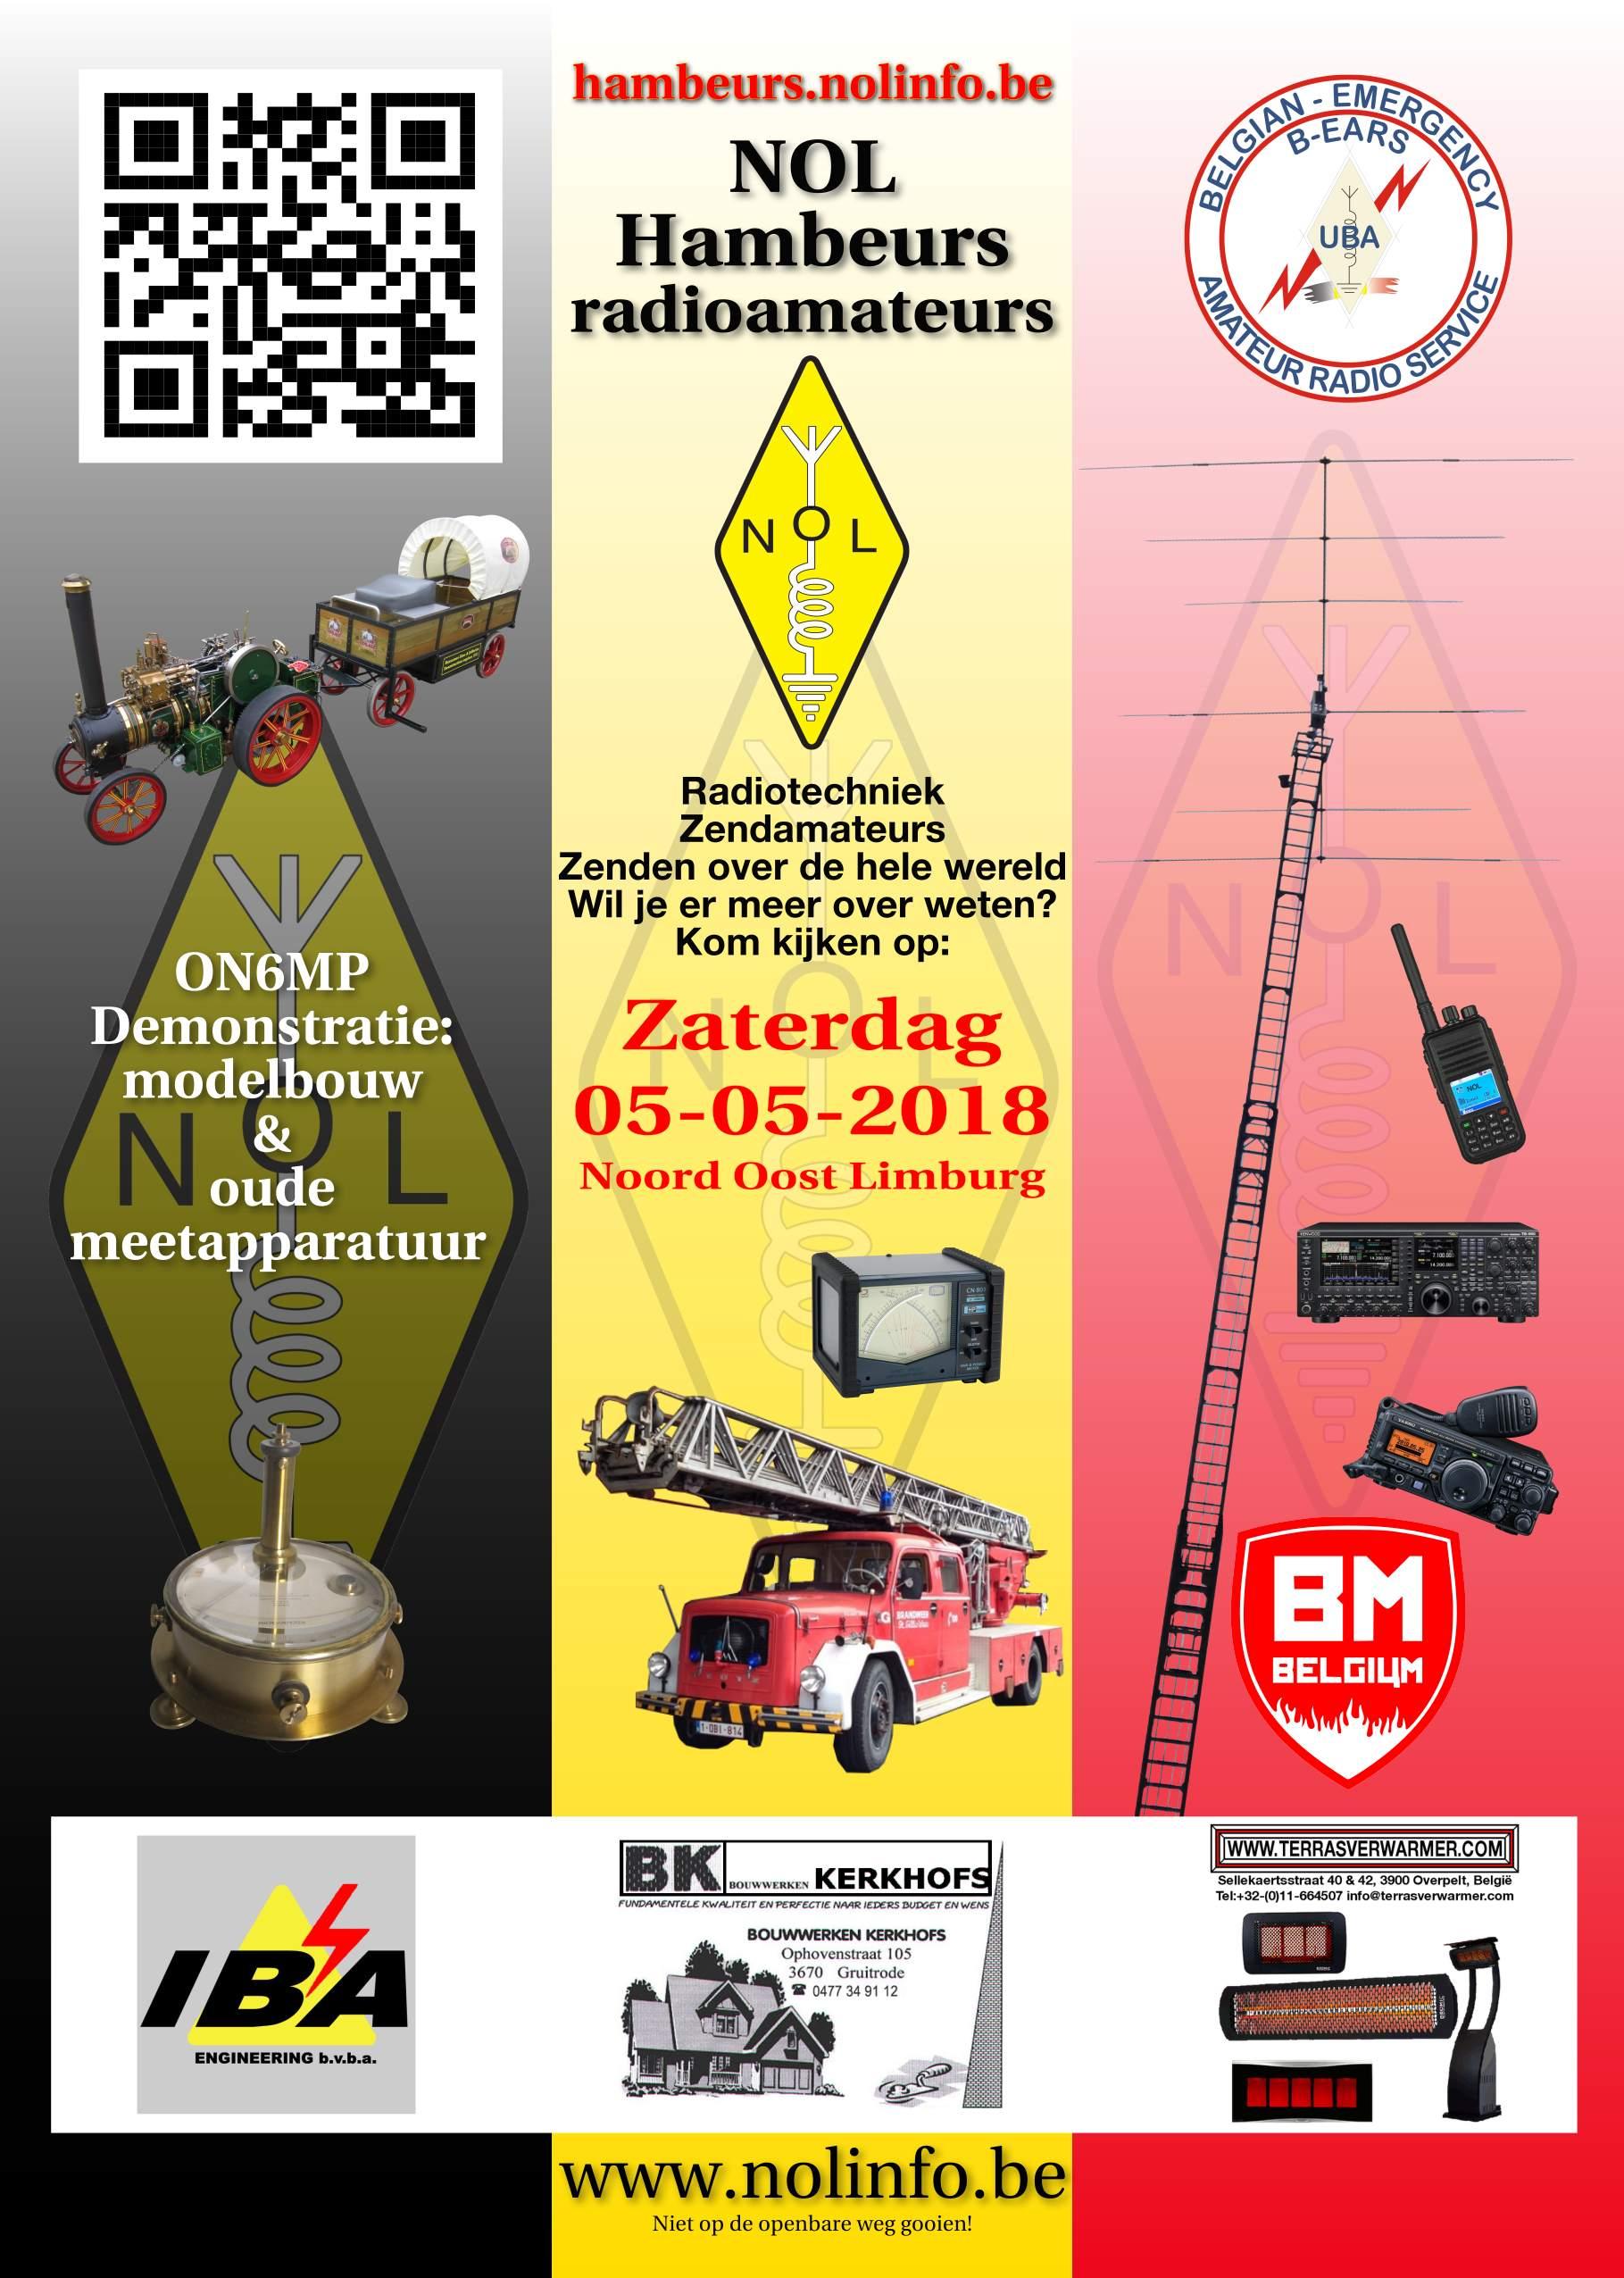 http://www.nolinfo.be/wp-content/uploads/2017/12/NOL-hambeurs-Flyer-achterkant-2018-©-small.jpg